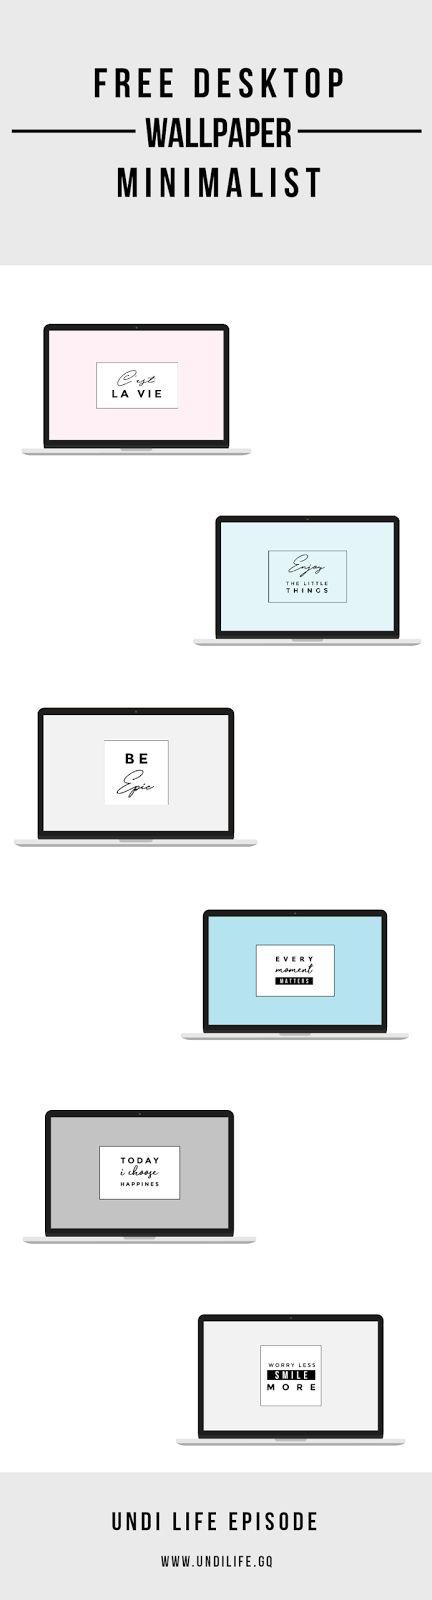 Free Minimalist Desktop Wallpaper